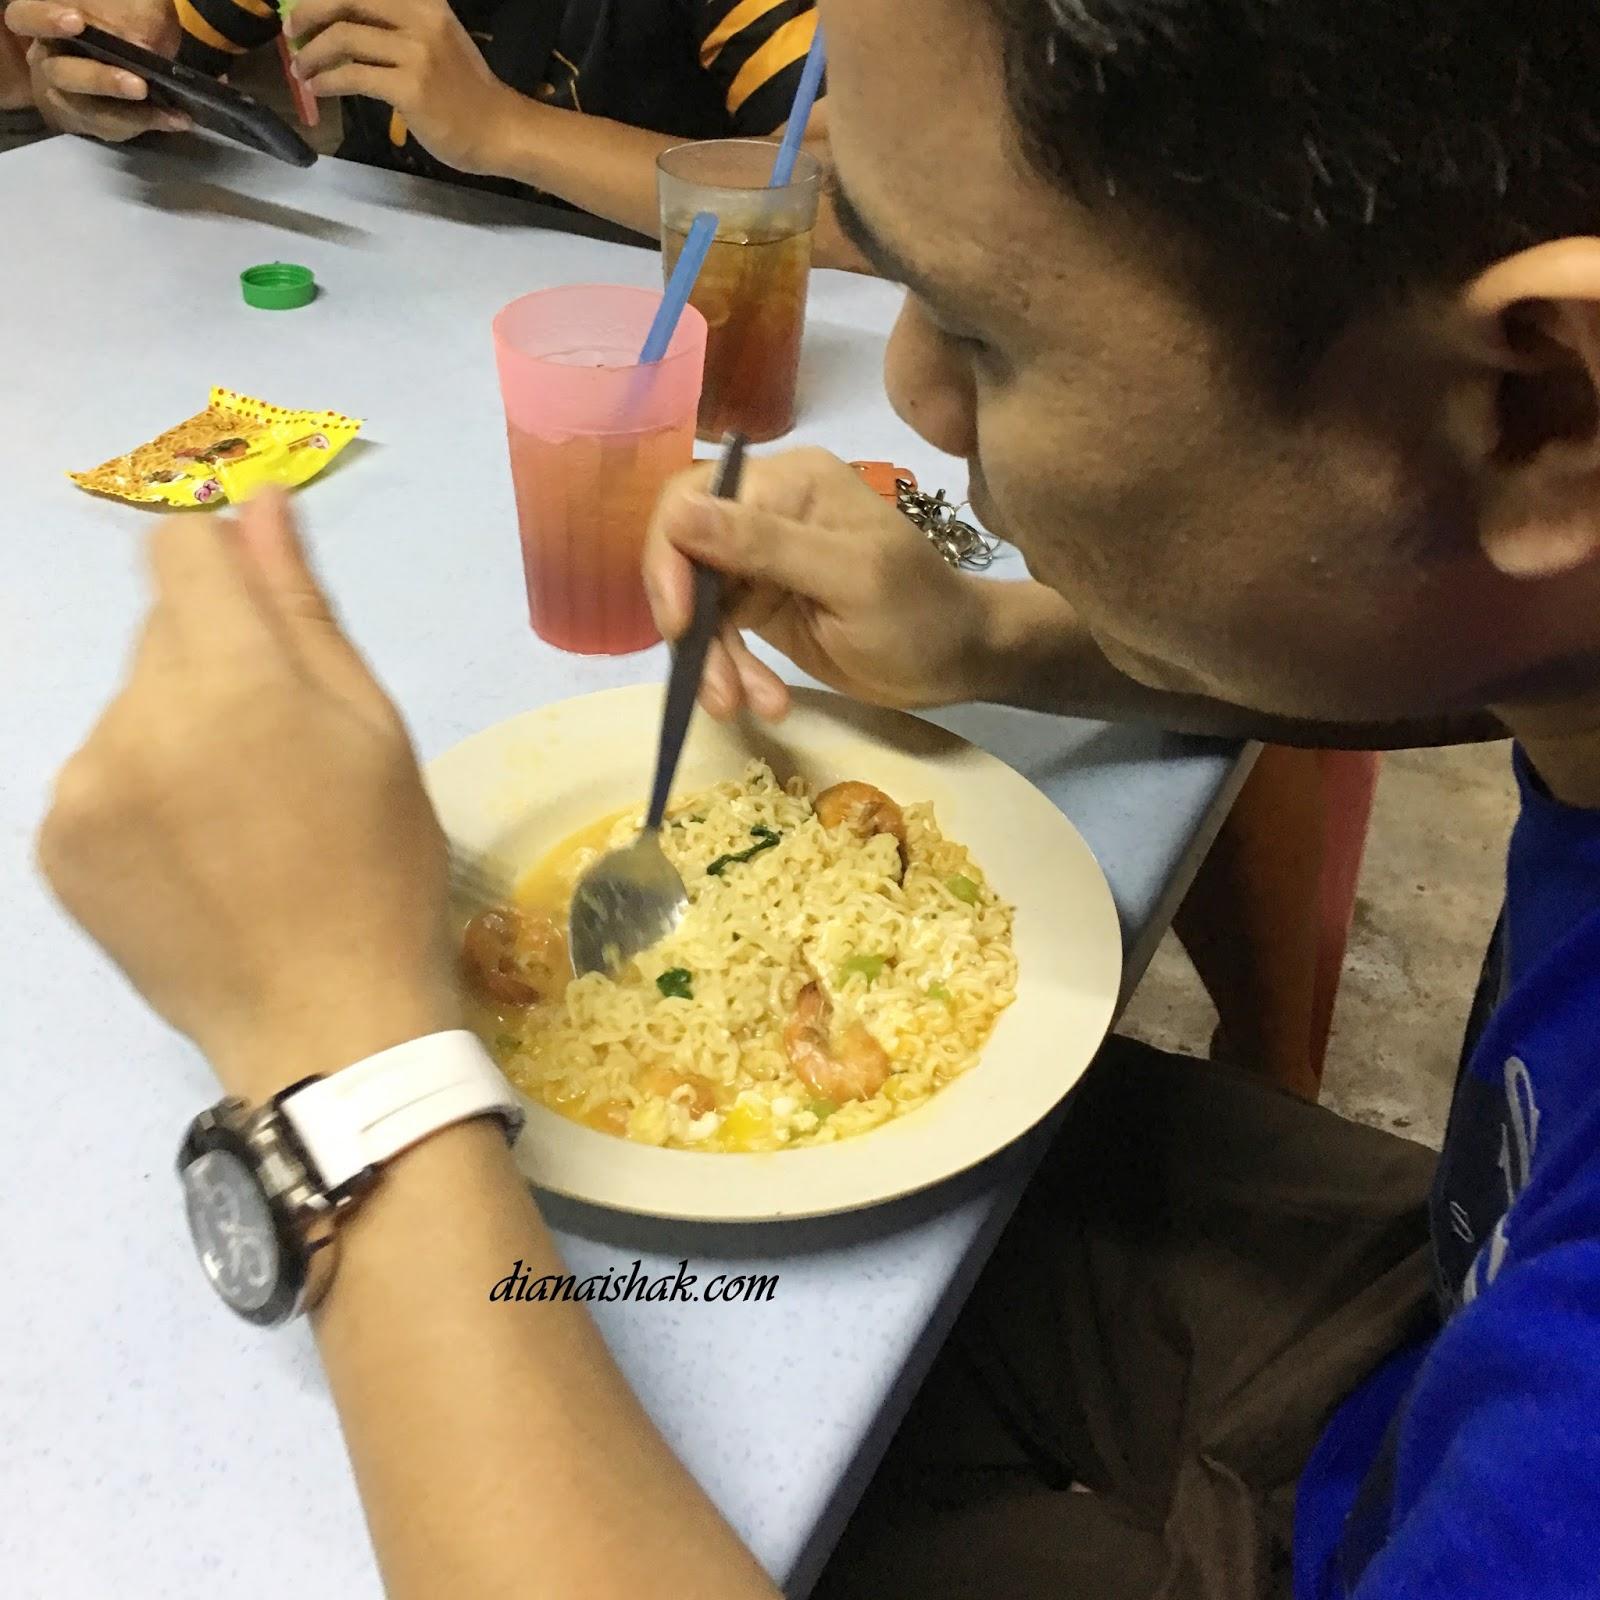 Again Bila Kitorang Dah Balik Dari Dinner Sekali Budak Ajak Makan Maggi Dapur Kayu Lagi Padahal Kenyang Kan Tapi Sebab Seronok Pul